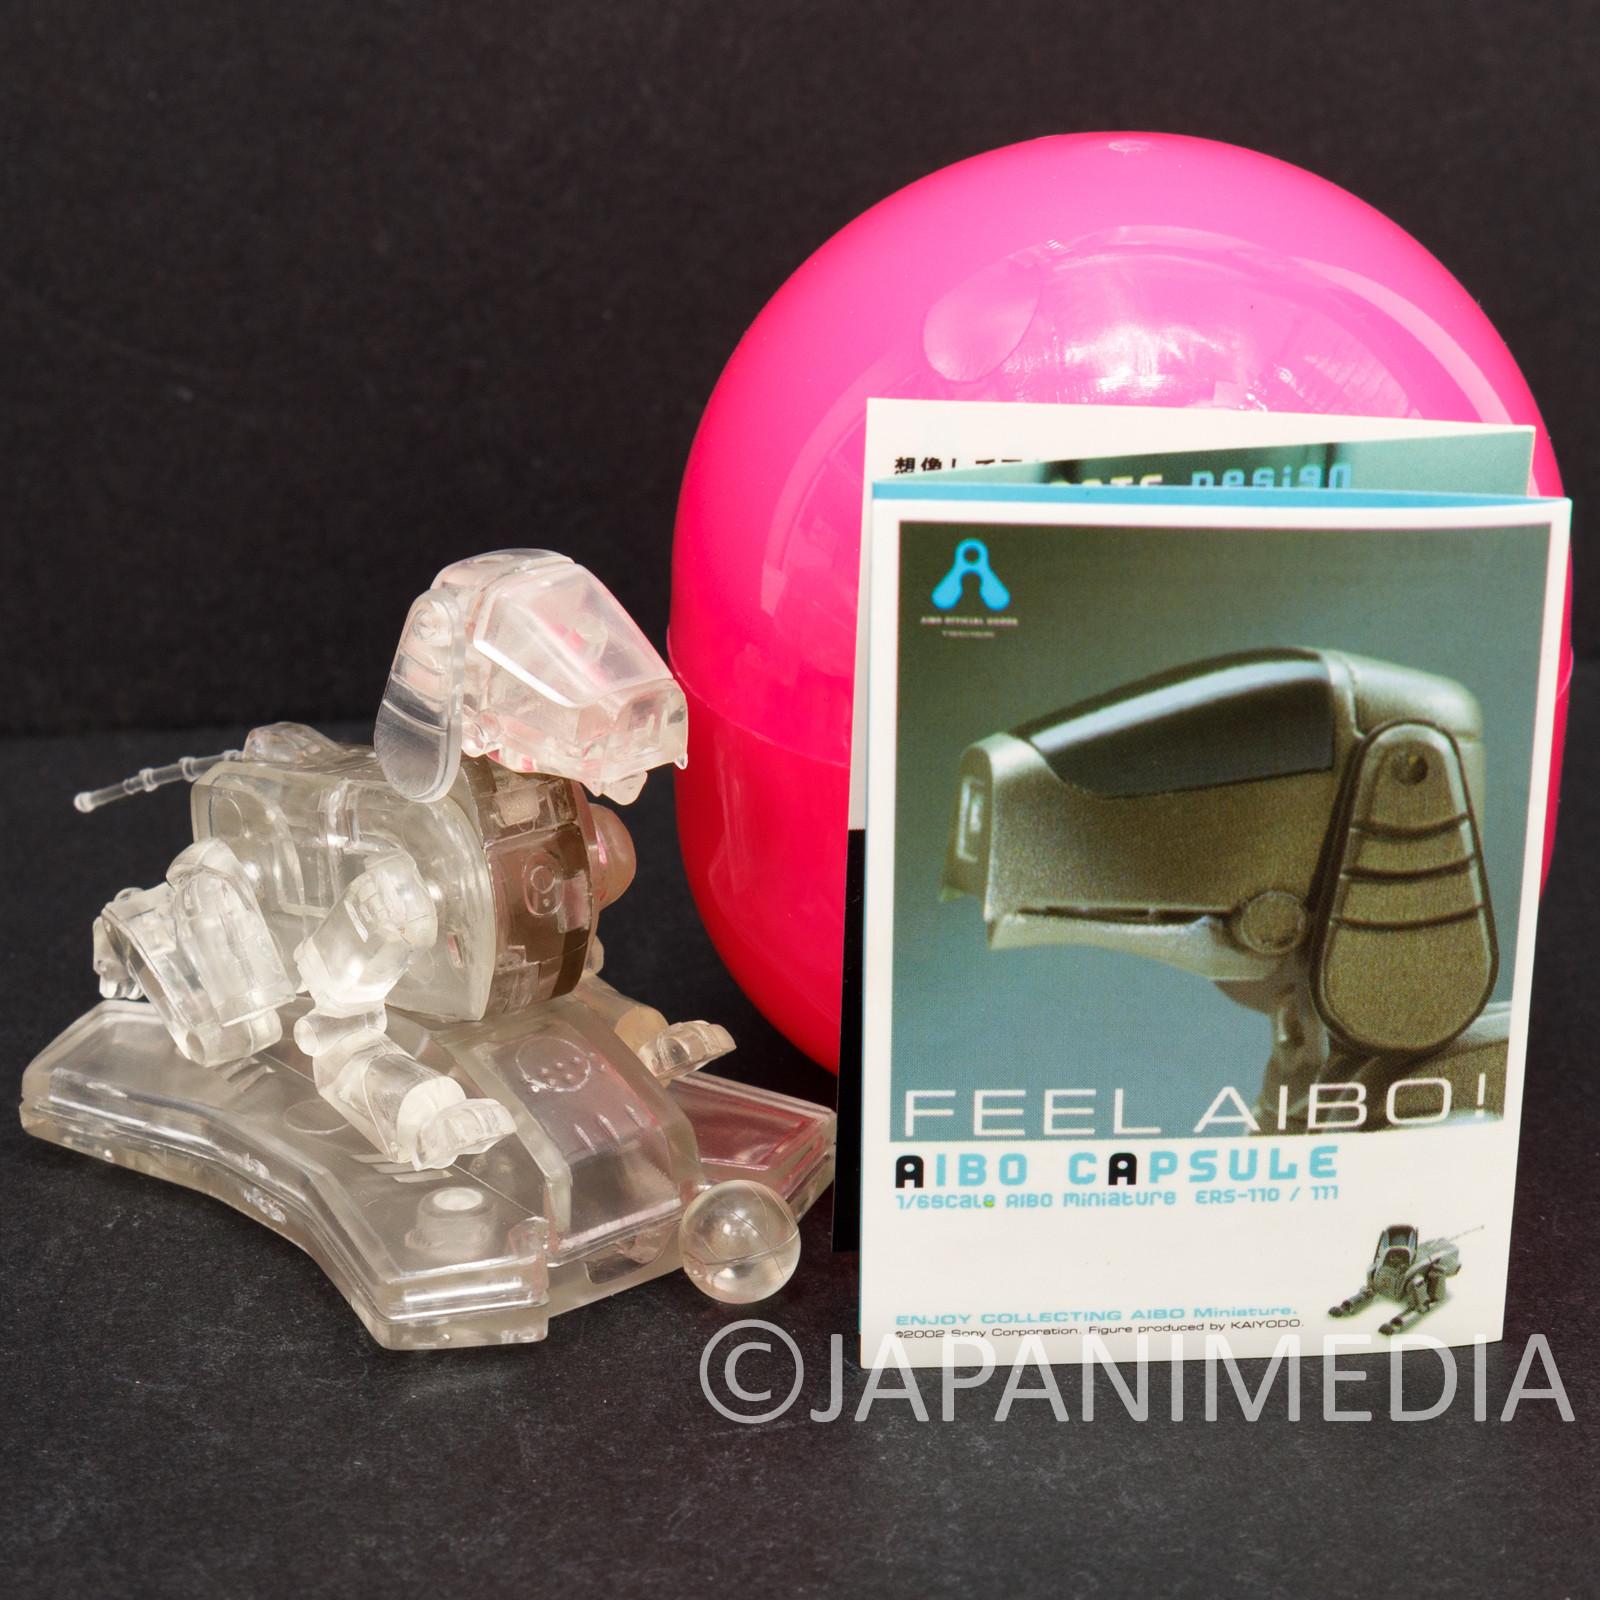 AIBO Capsule ERS-110 Translucent 1/6 Miniature Figure Kaiyodo JAPAN